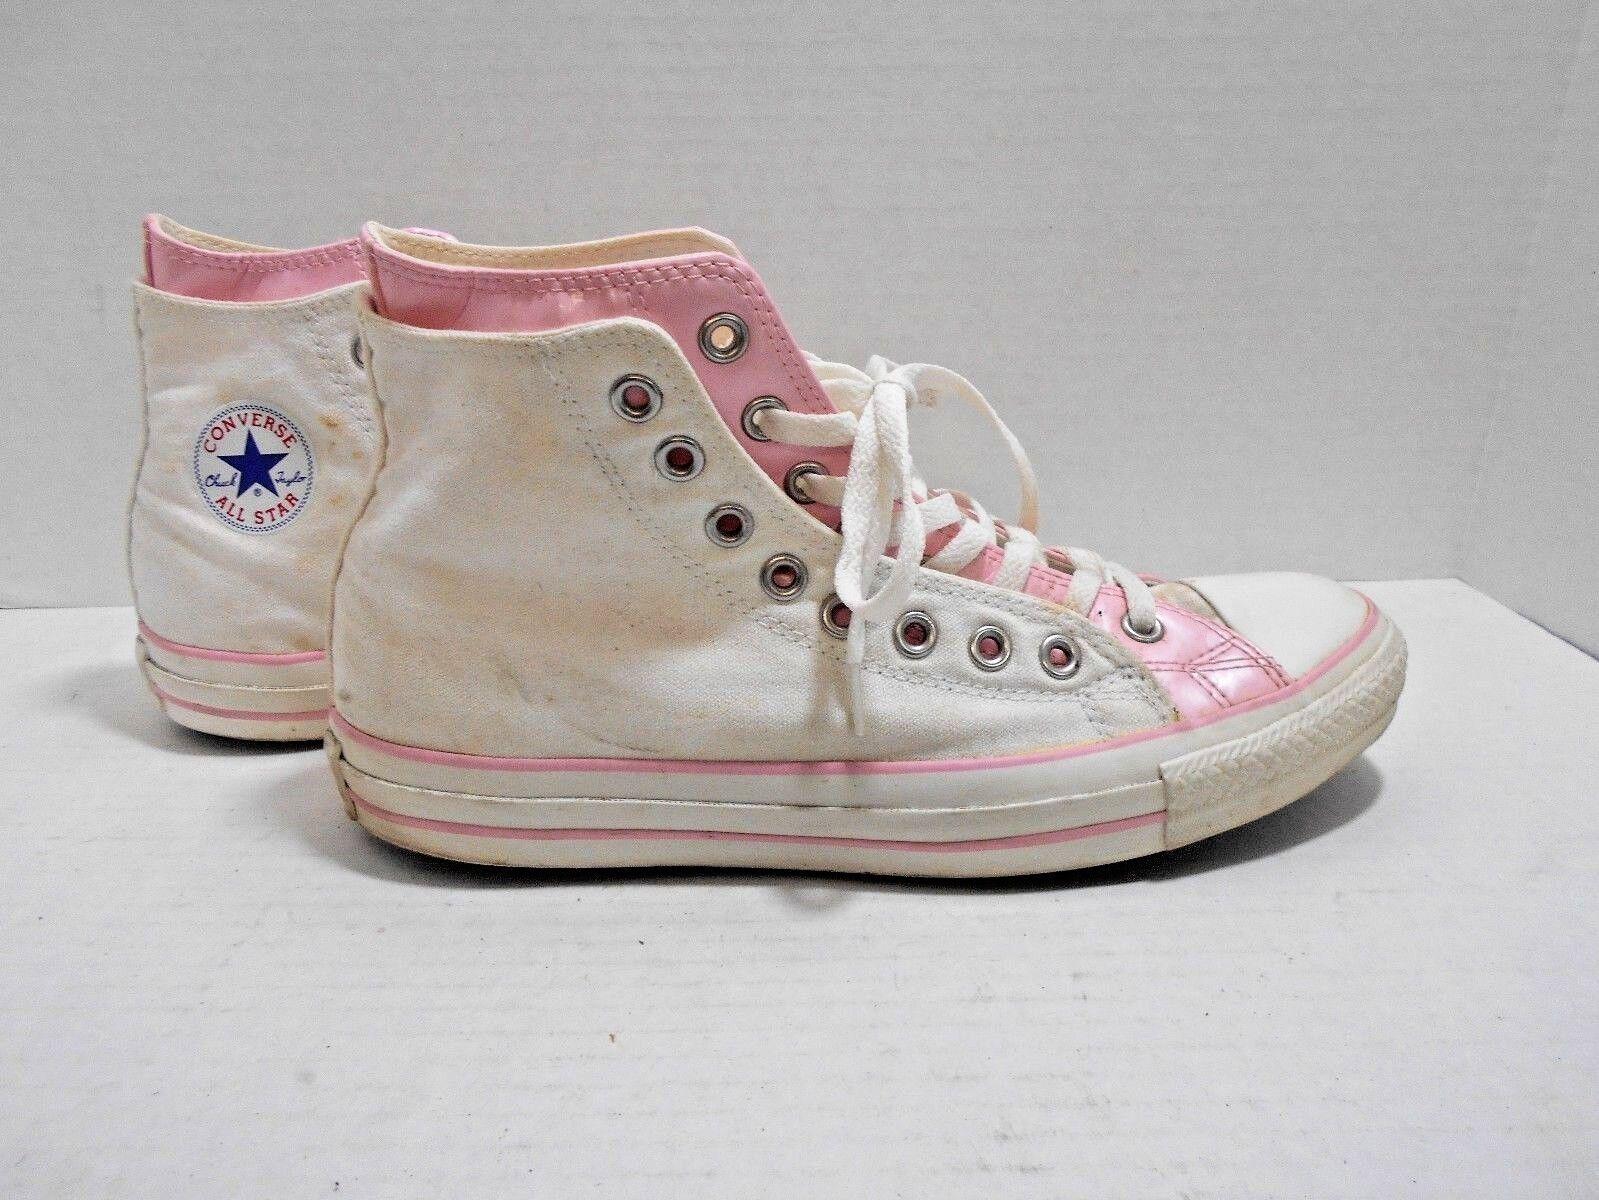 Converse ALL STAR Sneakers - USA HI TOP-  MEN'S USA - SIZE 9 - Pink/Weiß Double Upper 7de692